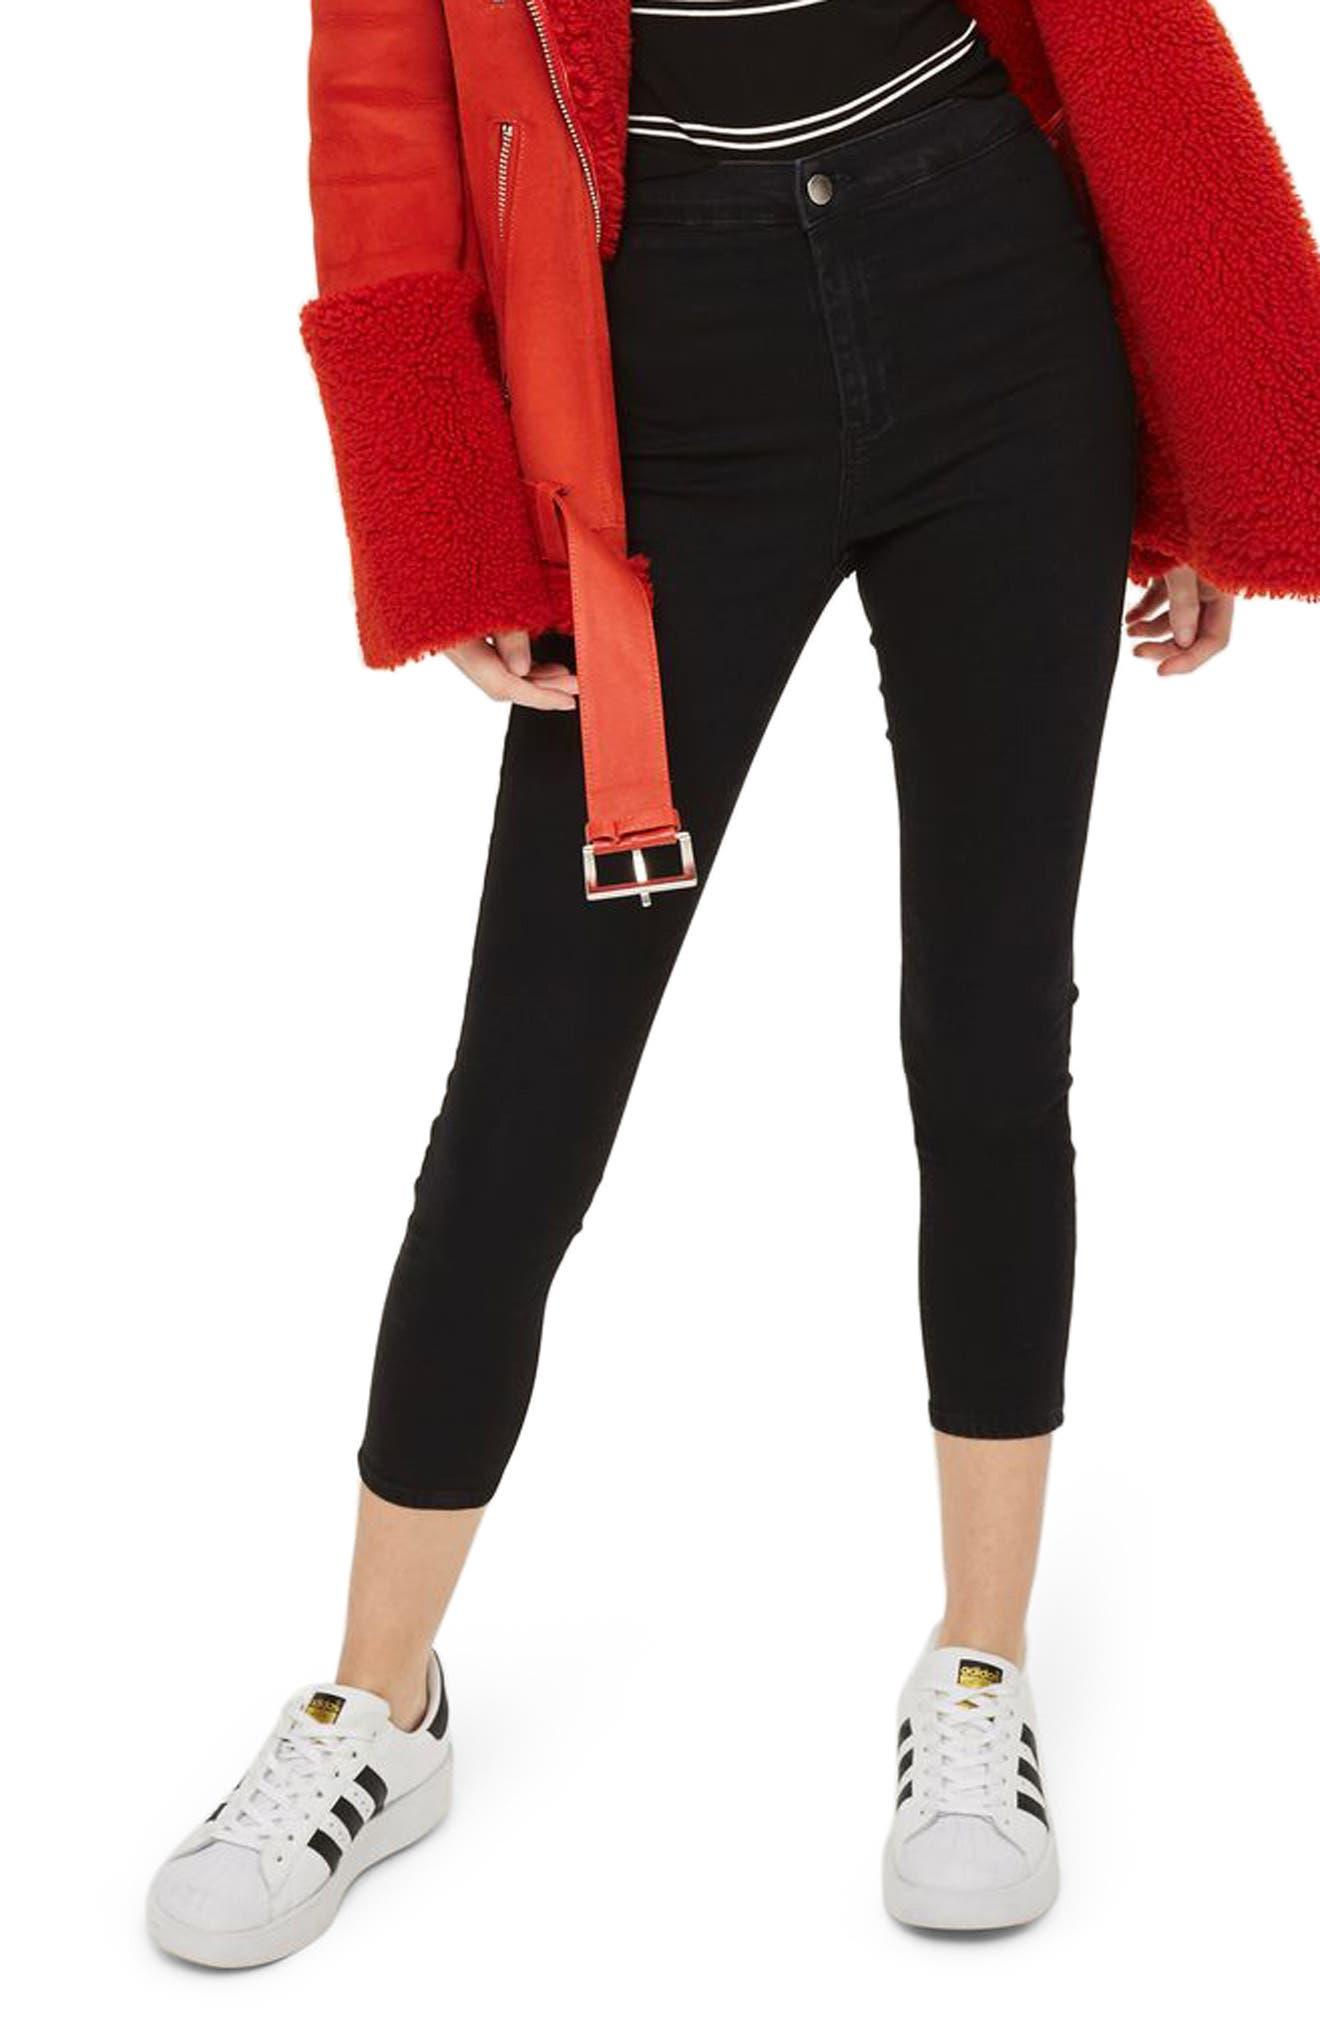 Main Image - Topshop Joni High Waist Crop Skinny Jeans (Petite)